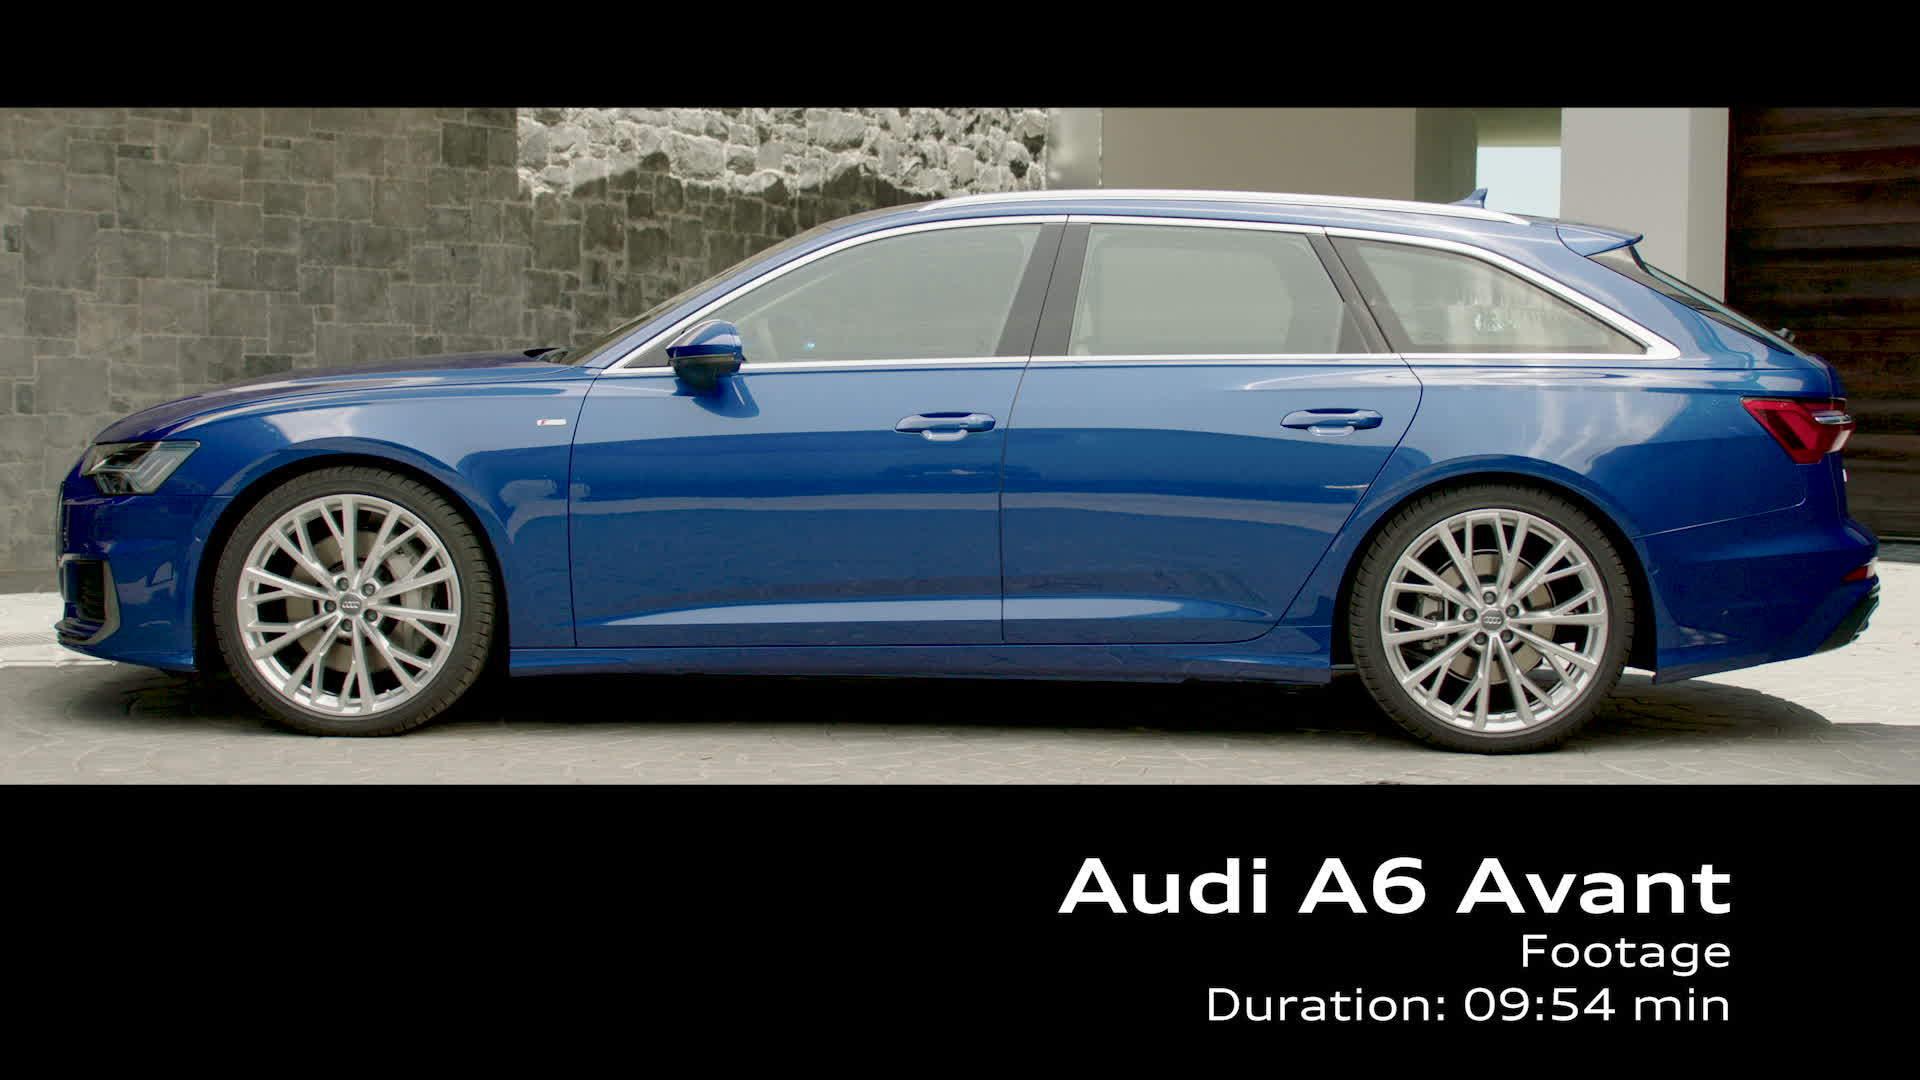 Audi A6 Avant Audi Mediacenter